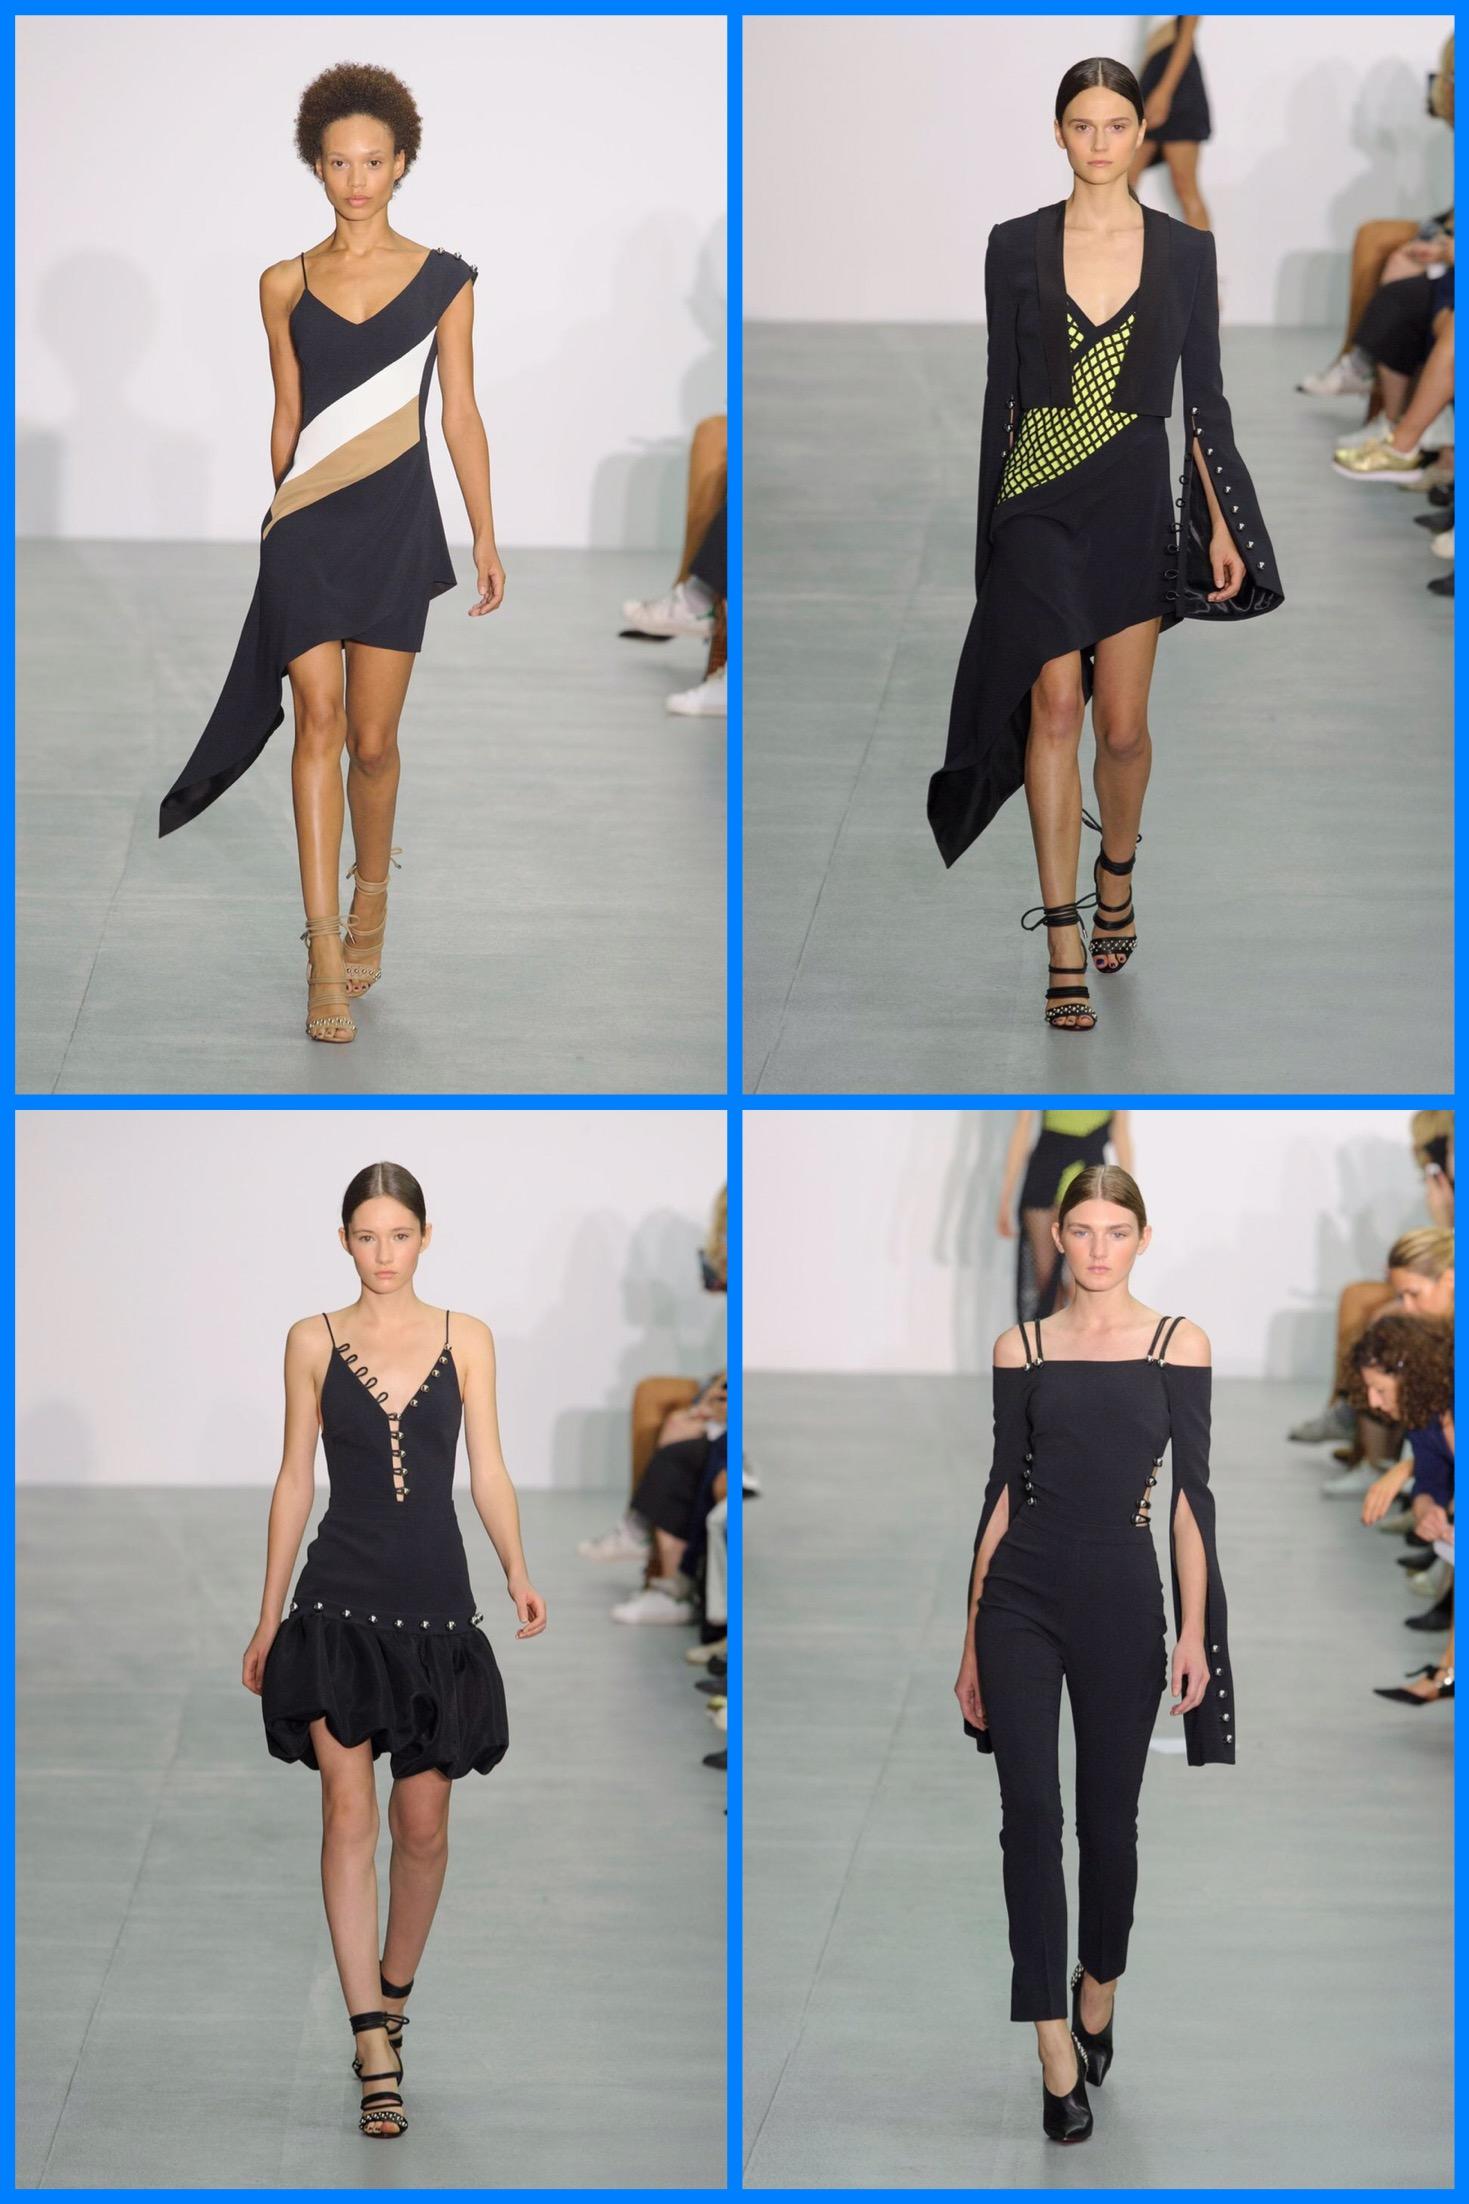 london-fashion-week-pret-a-porter-spring-summer-2017-style-david-koma